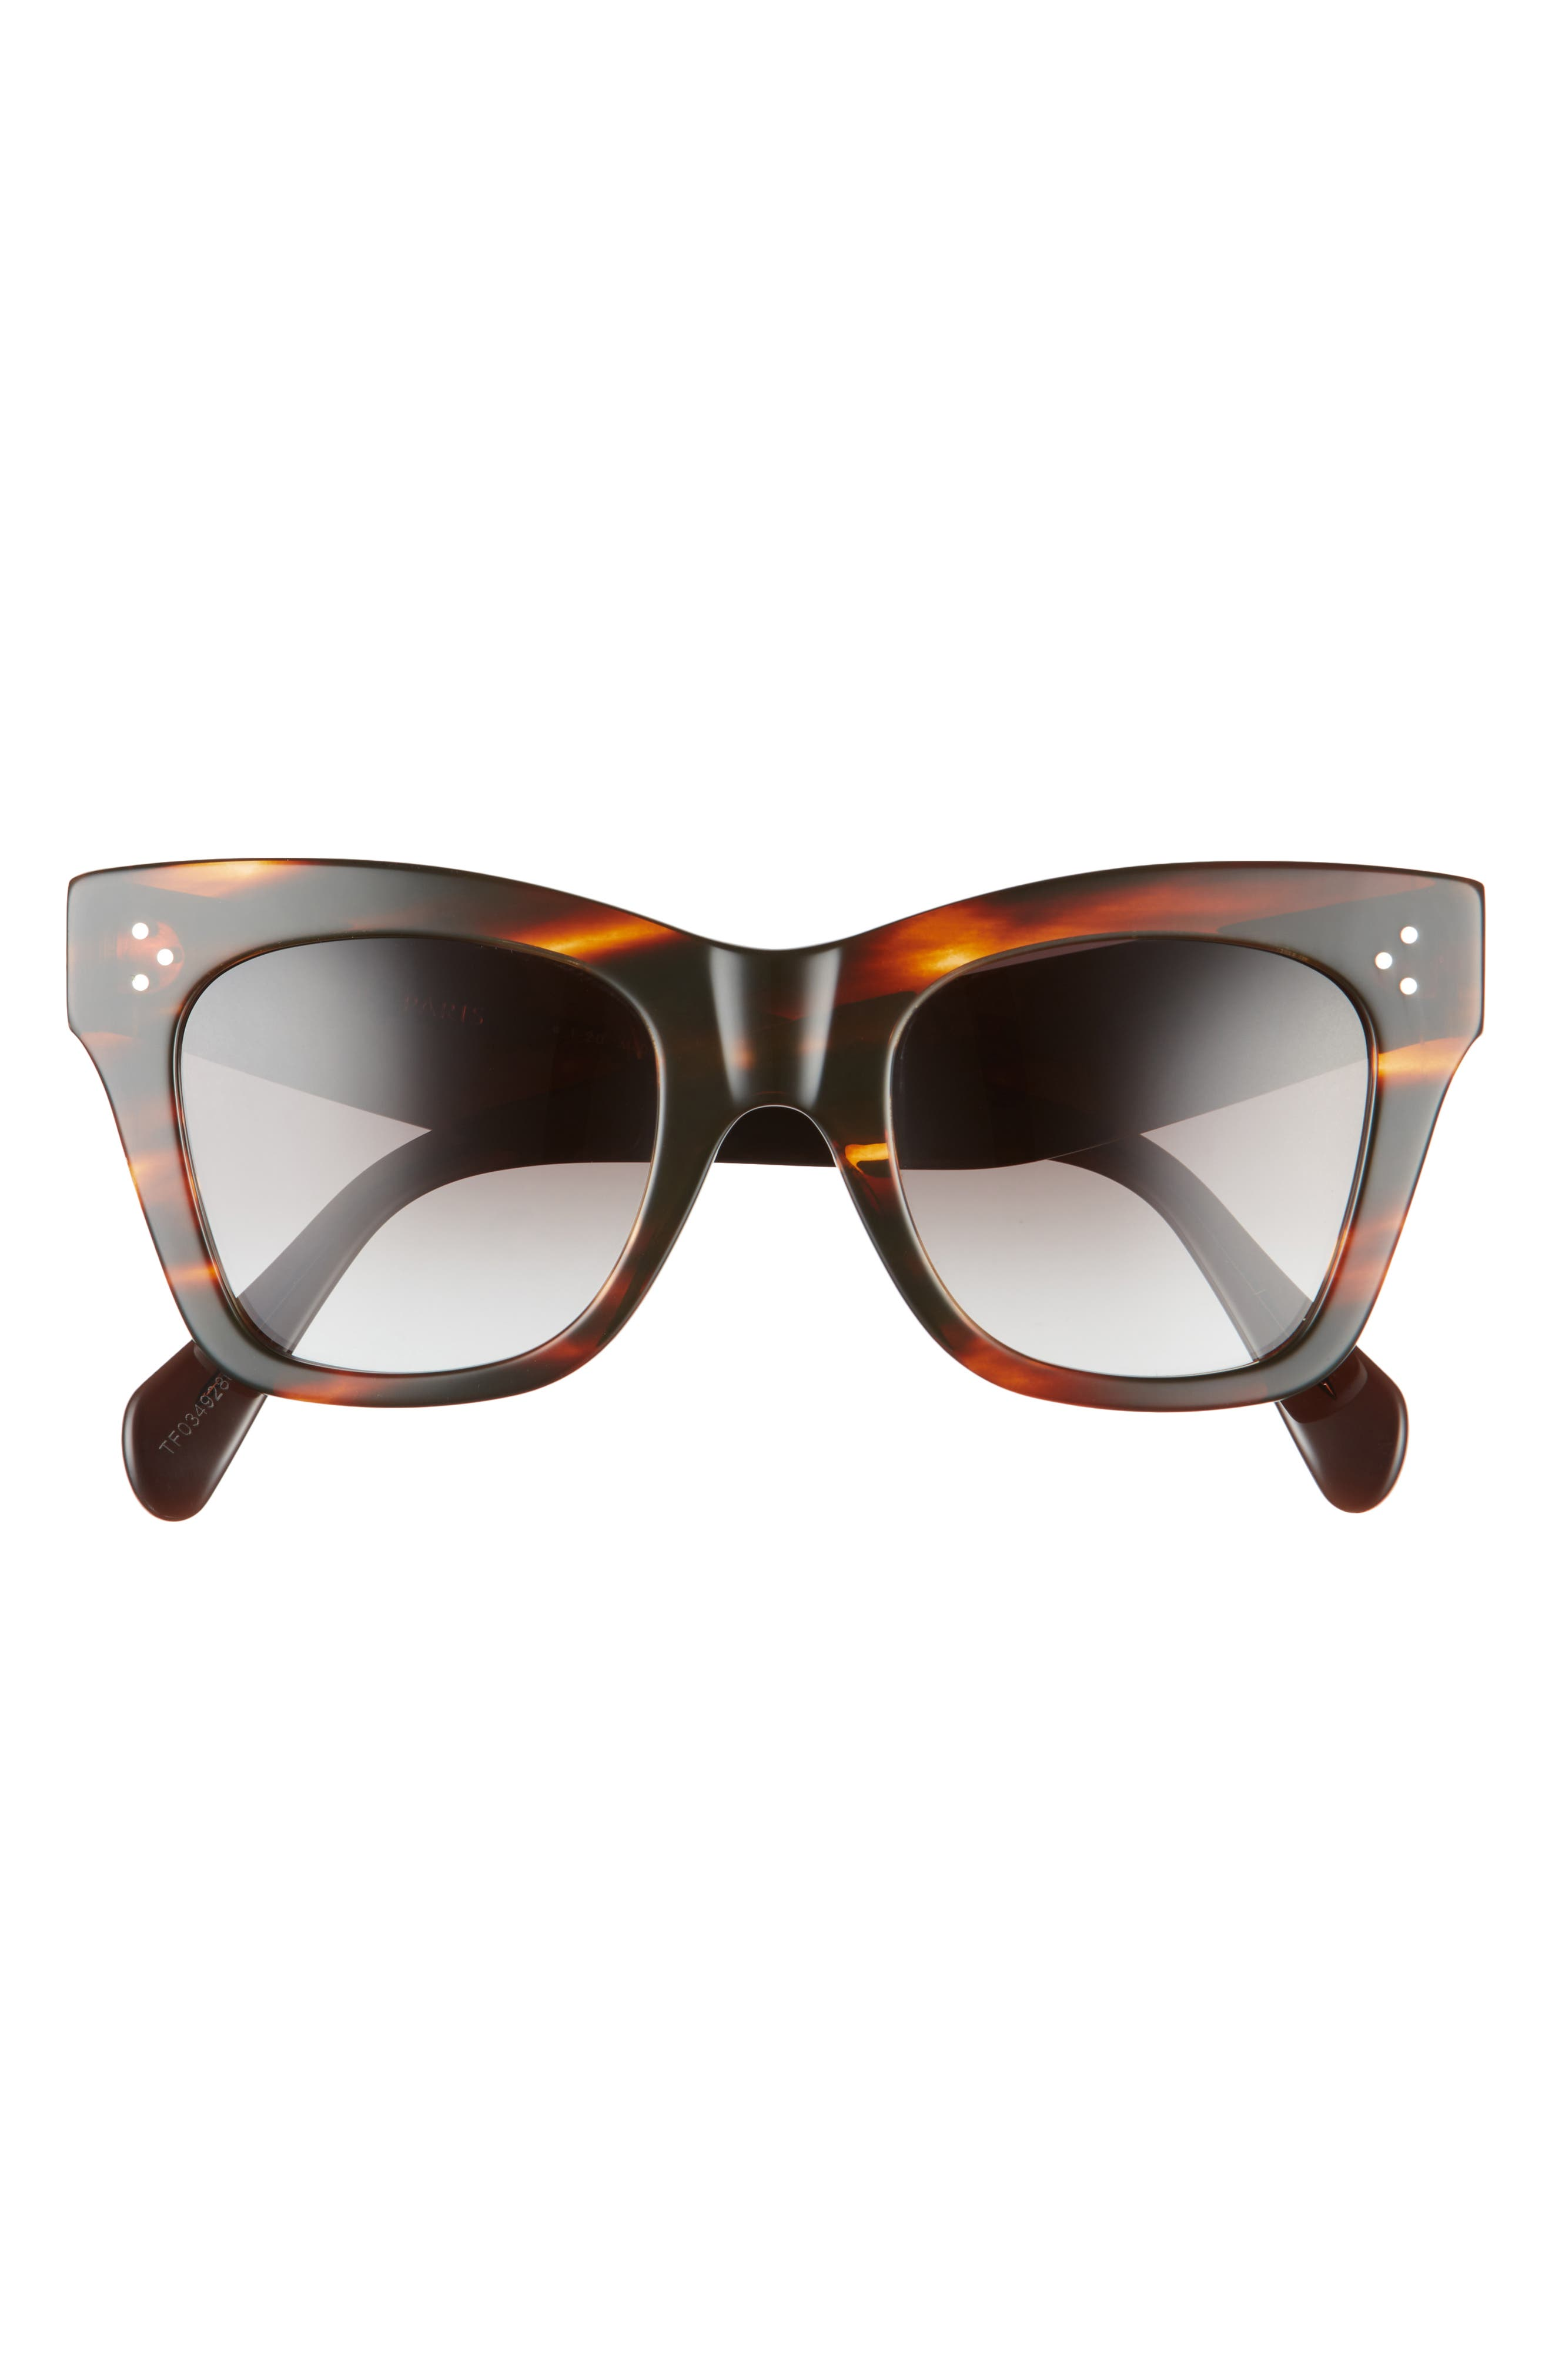 50mm Gradient Cat Eye Sunglasses